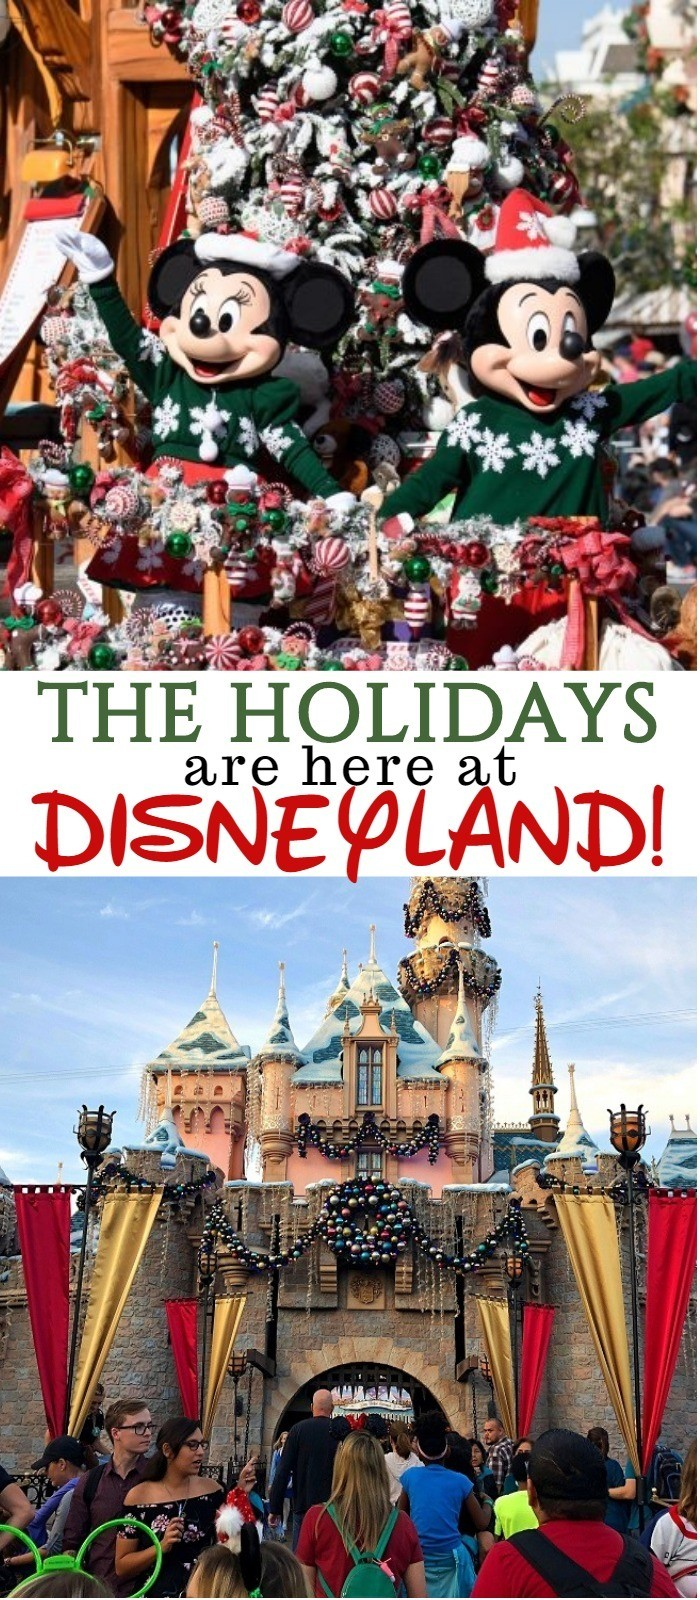 Christmas Time At Disneyland - Experience The Magic Of Disneyland Holidays!